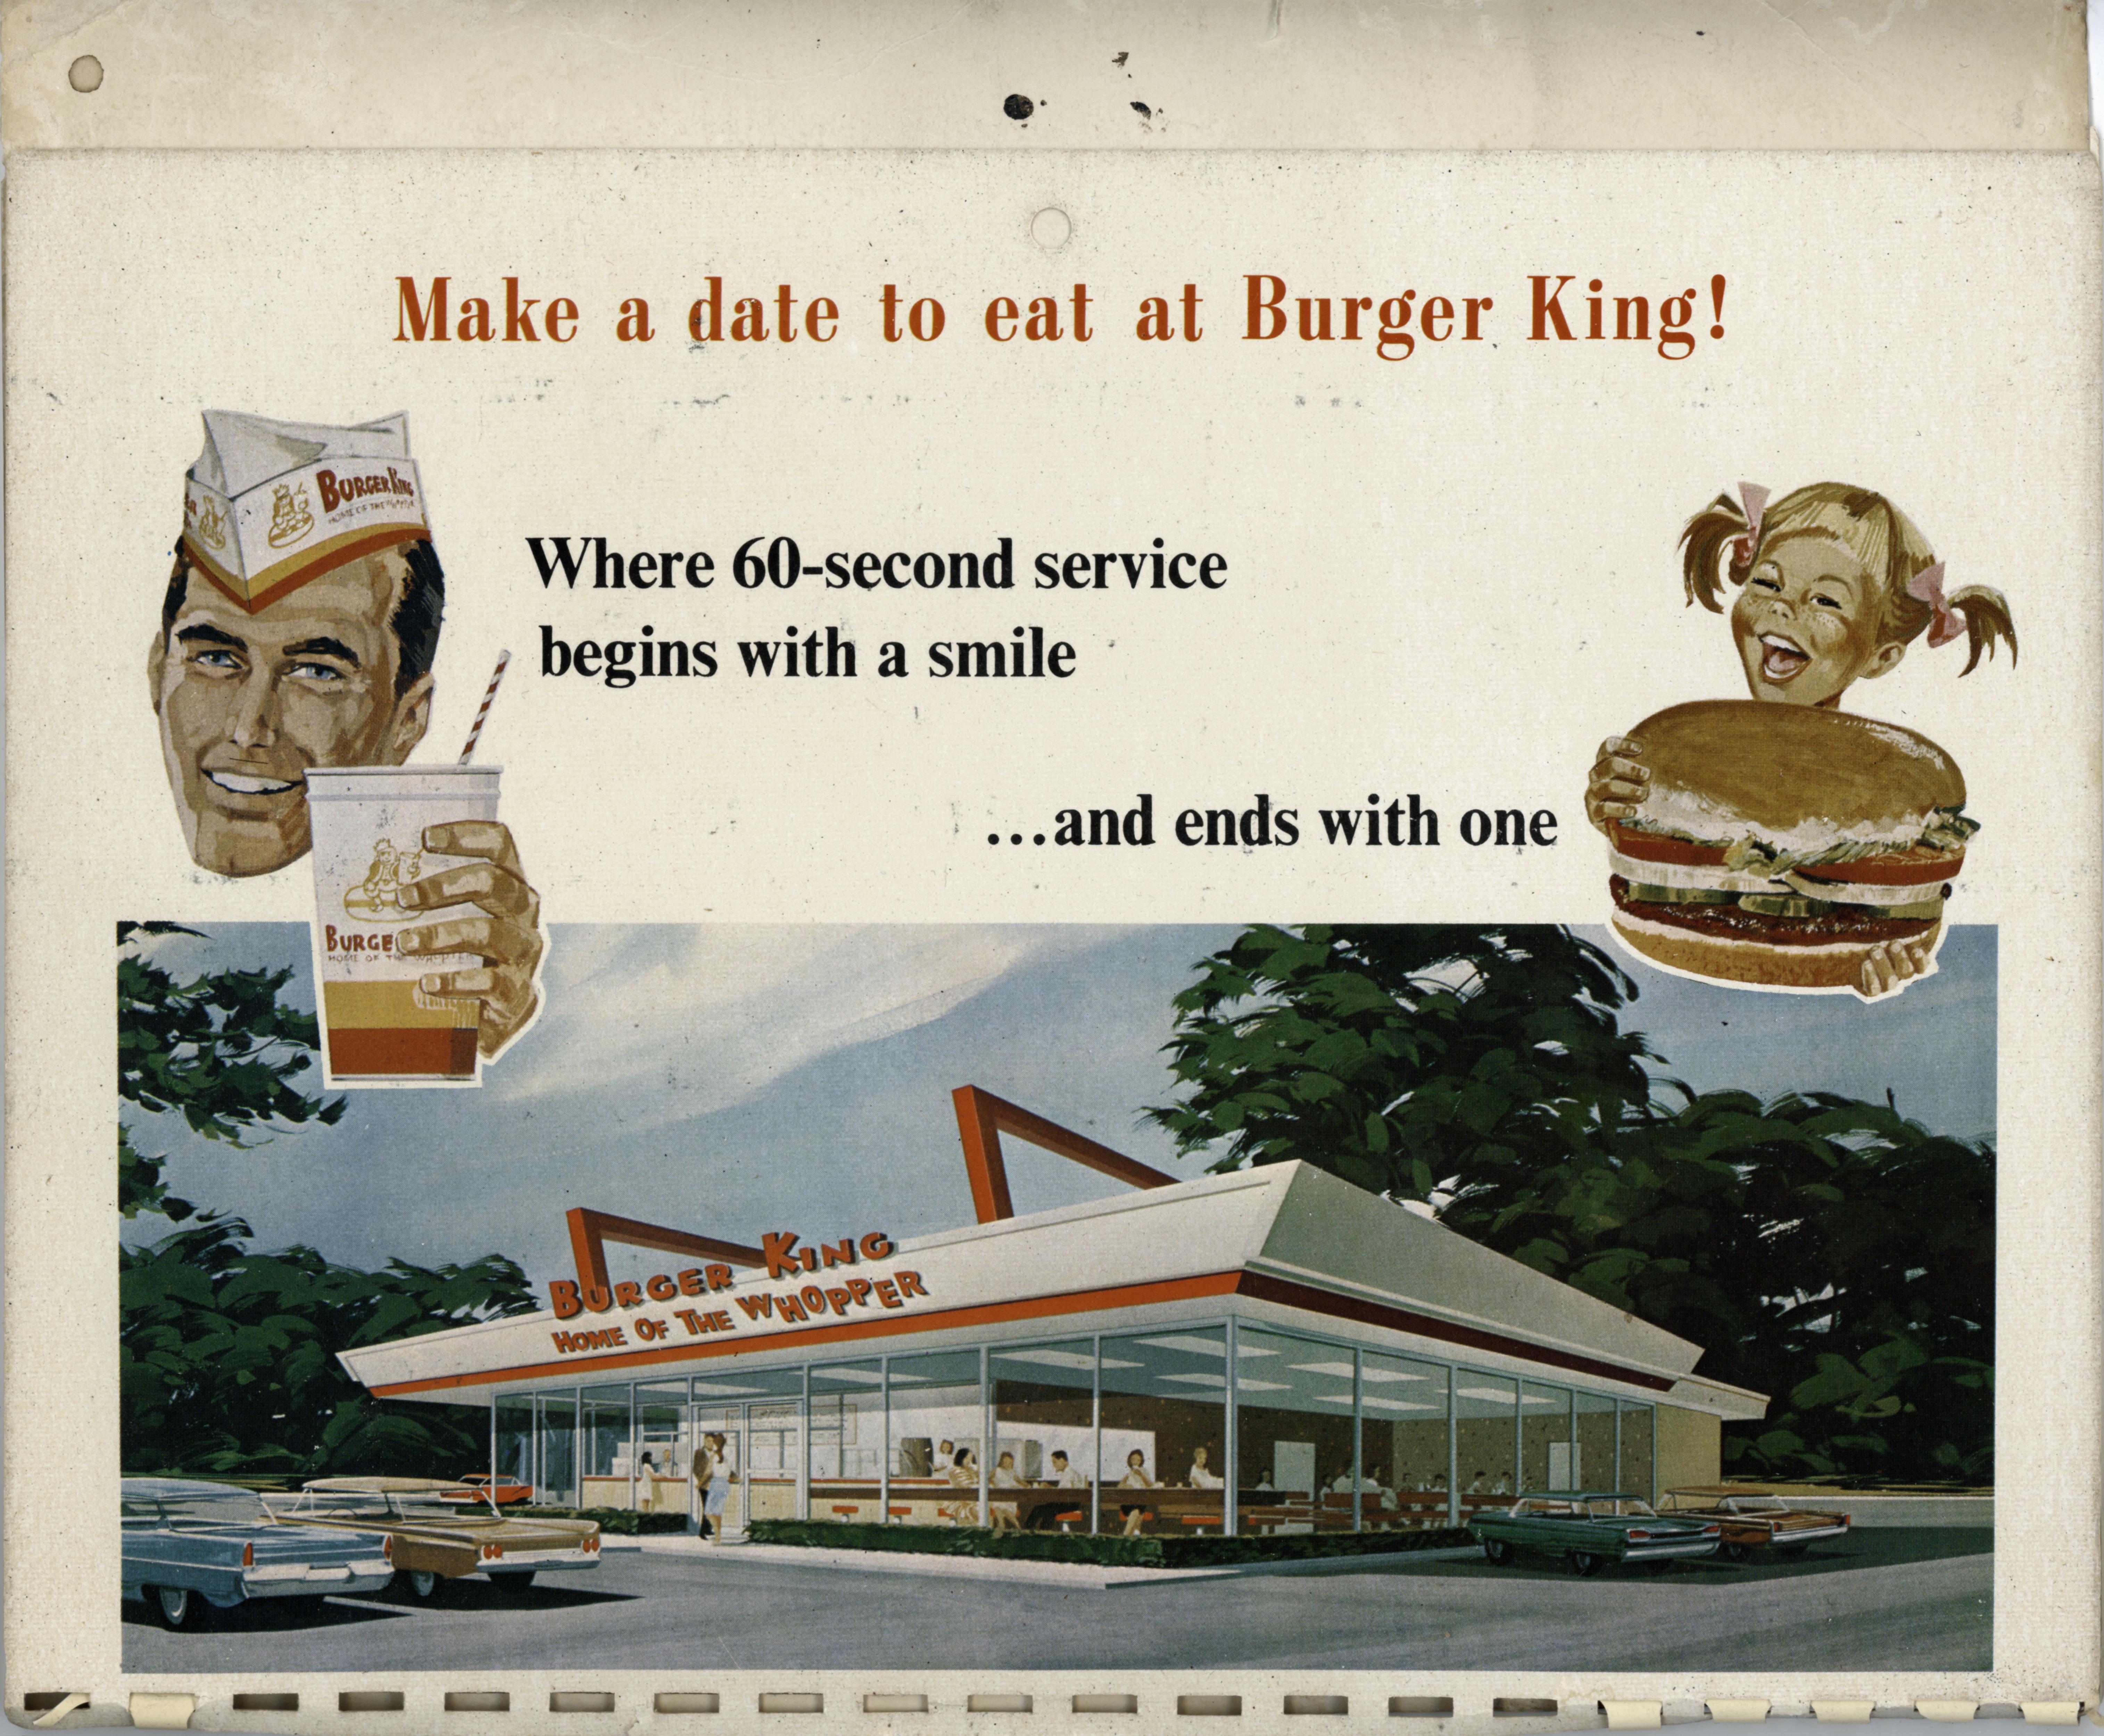 1968 and 1969 burger king calendars  u00ab james k  radke